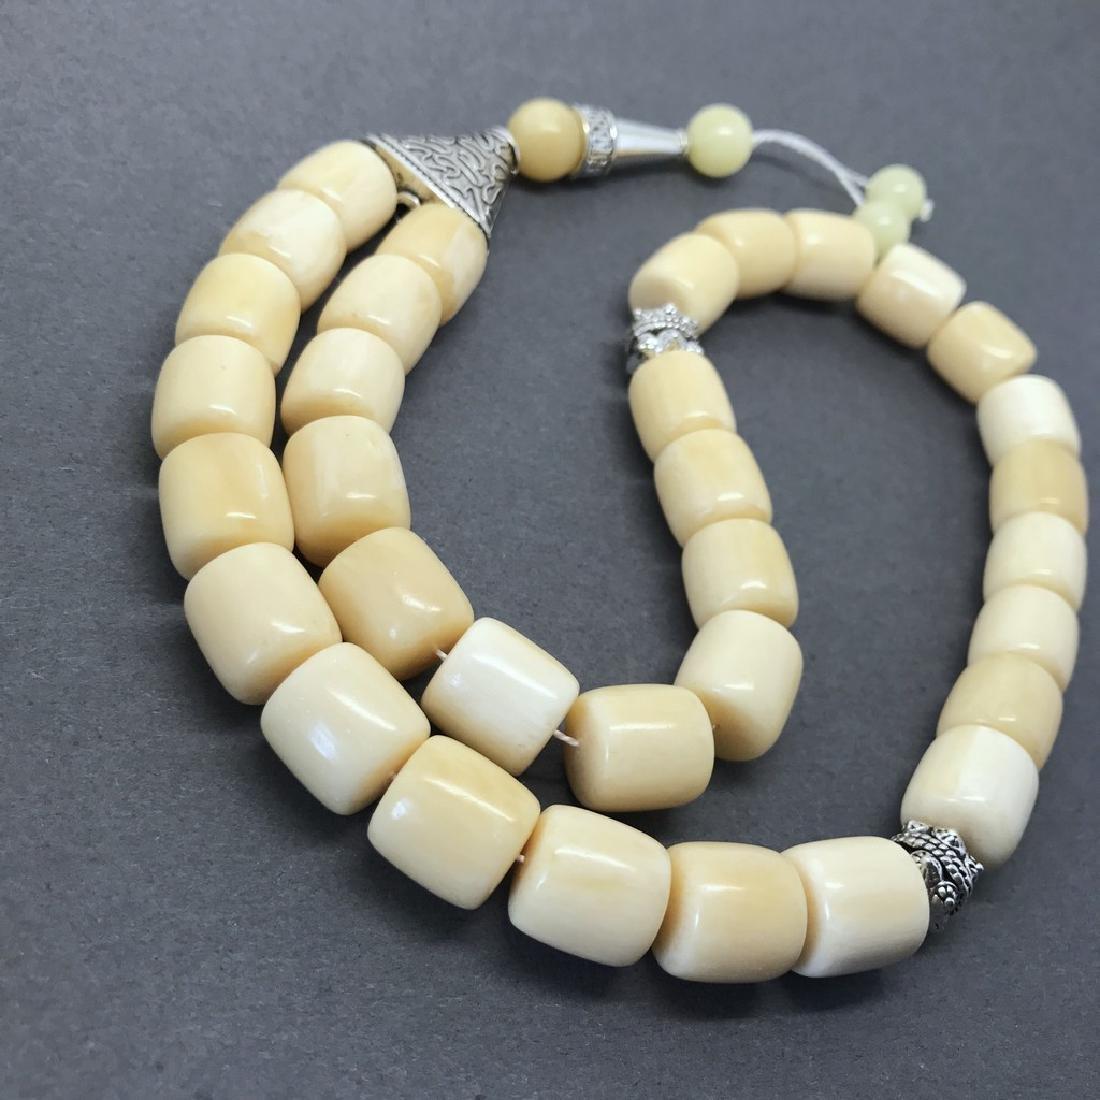 Tesbih rosary 33 Baltic amber beads barrel 12x13mm 75 - 2